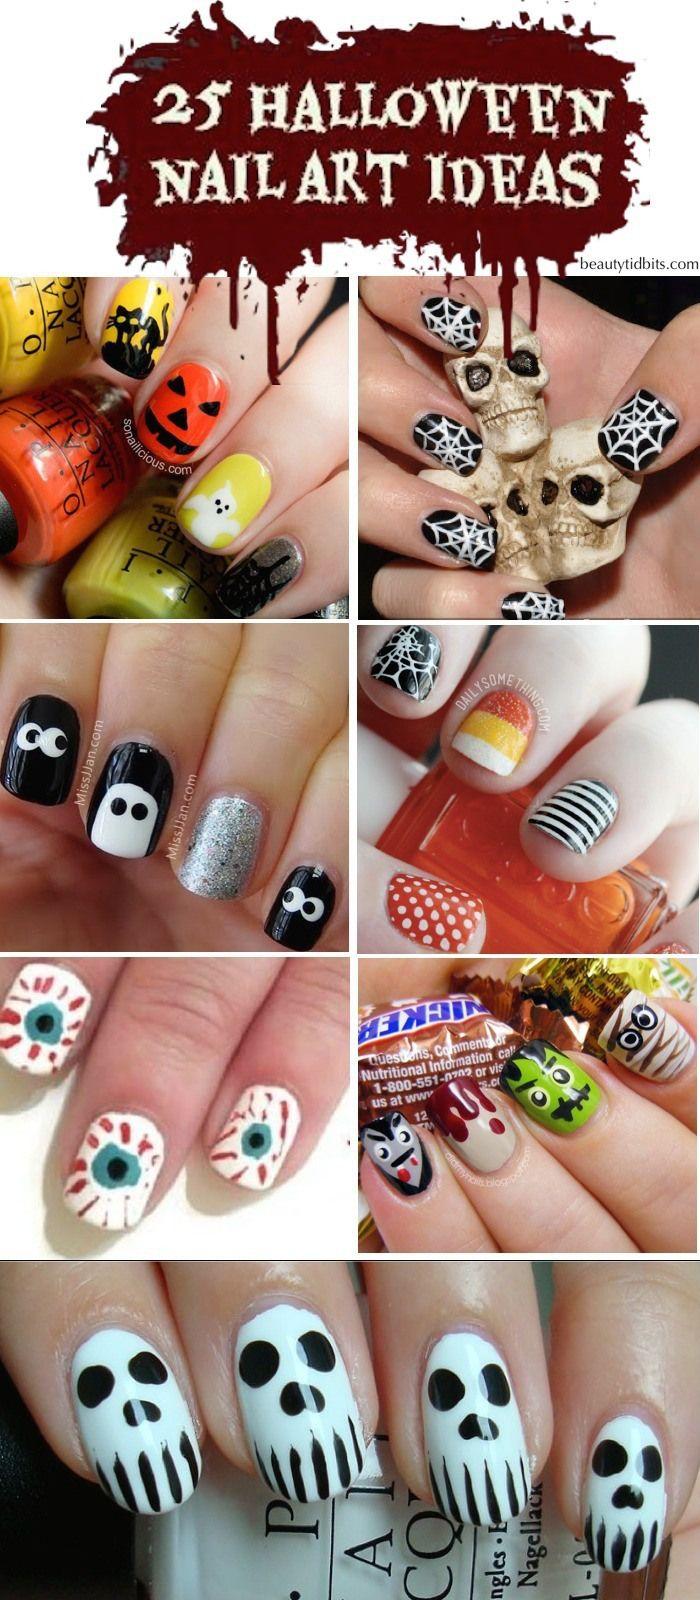 25 Spooky & Simple Halloween Nail Art Ideas | Halloween ...